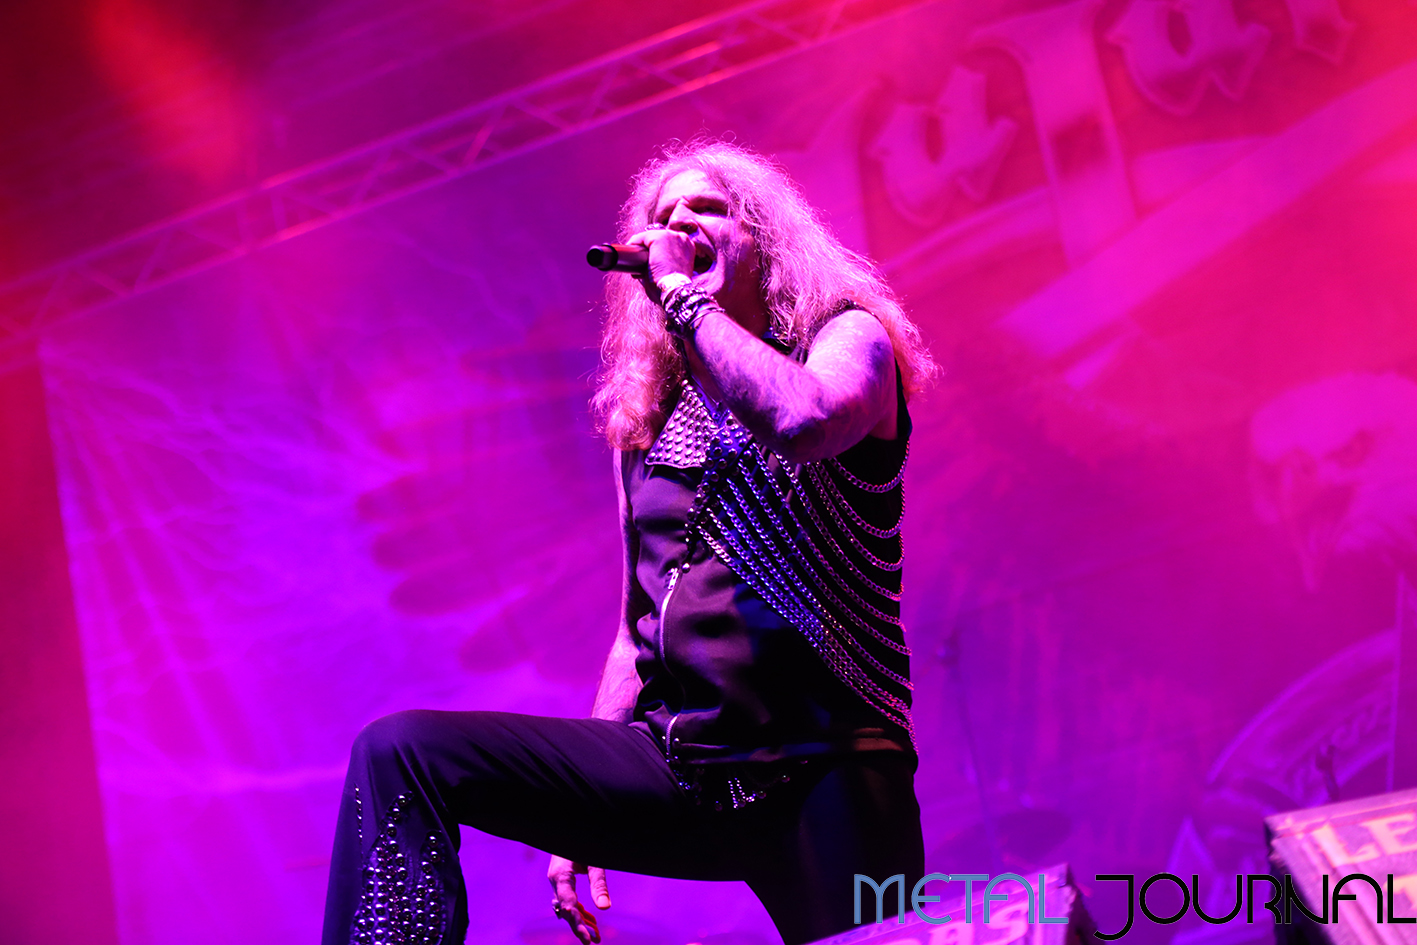 lujuria - leyendas del rock 2019 metal journal pic 3